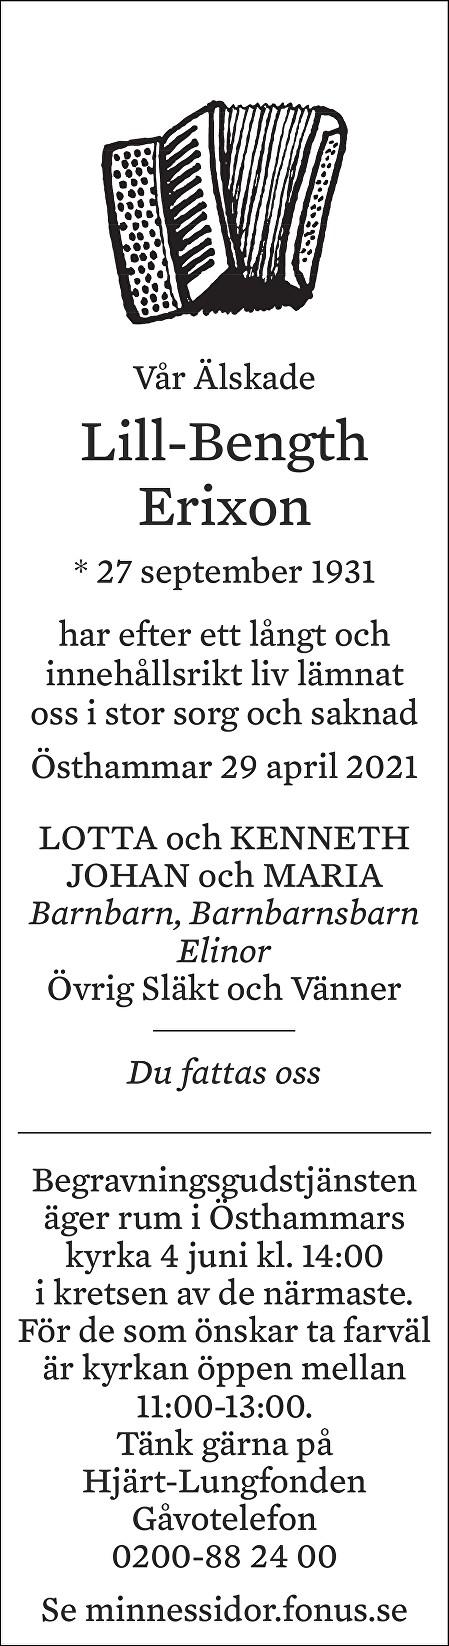 Bength Erixon Death notice